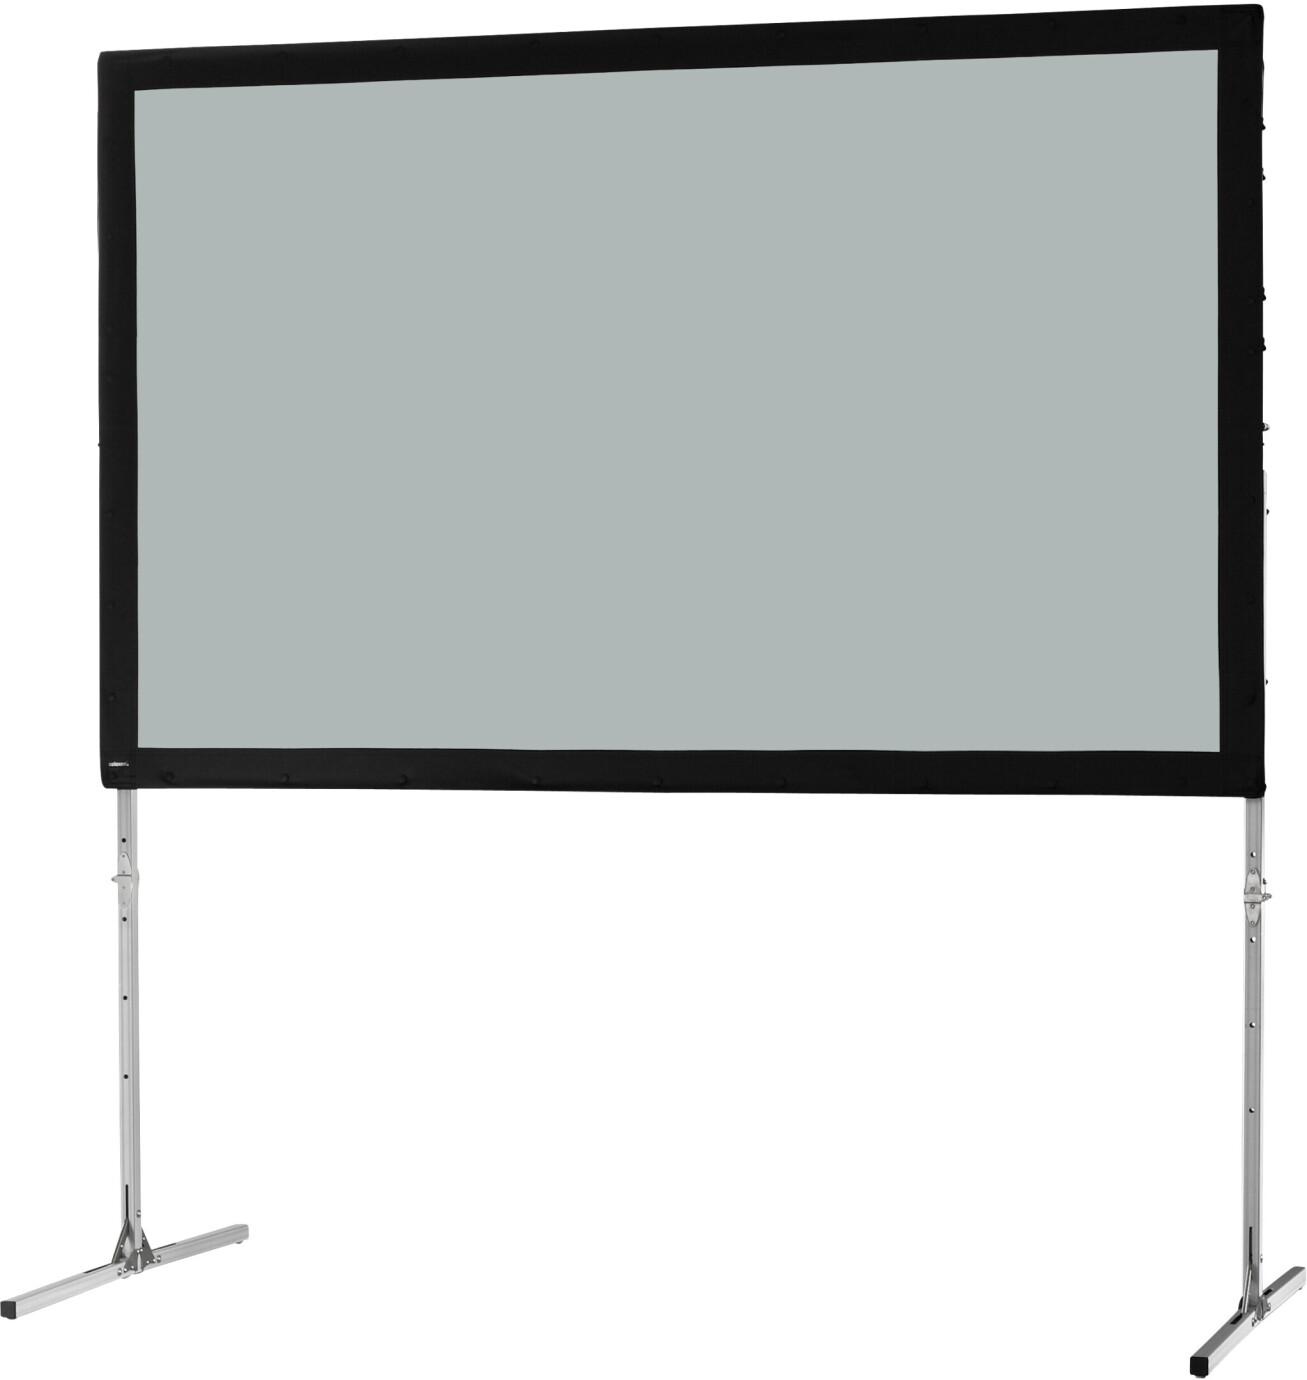 Celexon - Mobile Expert - 203cm x 127m - 16:10 - Rear Projection Complete - Fast Fold Projector Screen